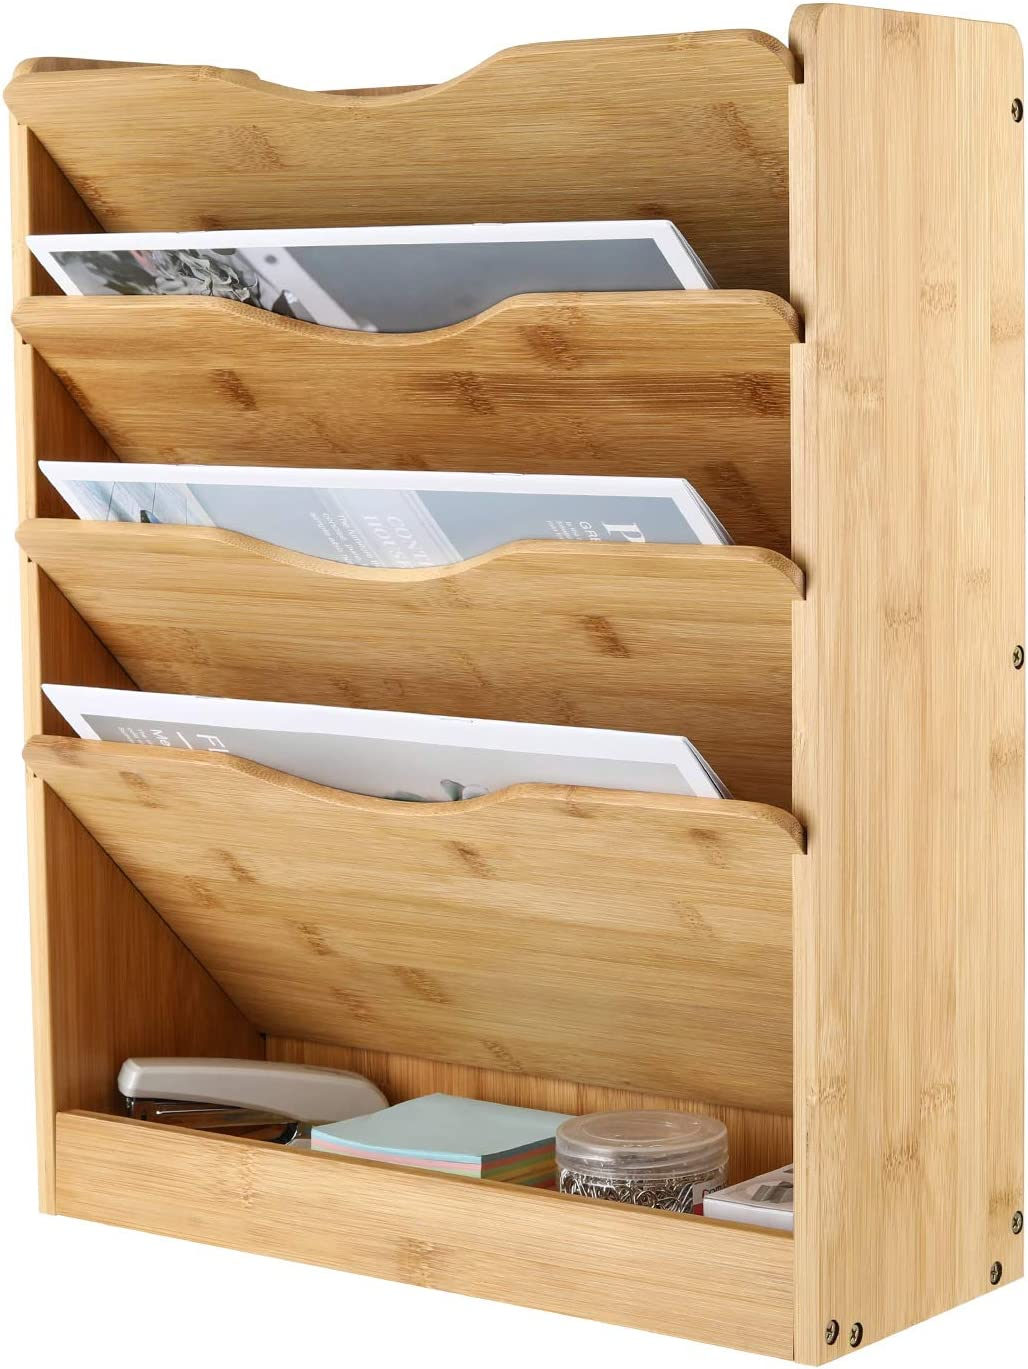 TQVAI Natural Bamboo Wall File Holder Organizer 5 Tier Hanging Magazine Rack Vertical Desktop Supplies Storage Upright - Original